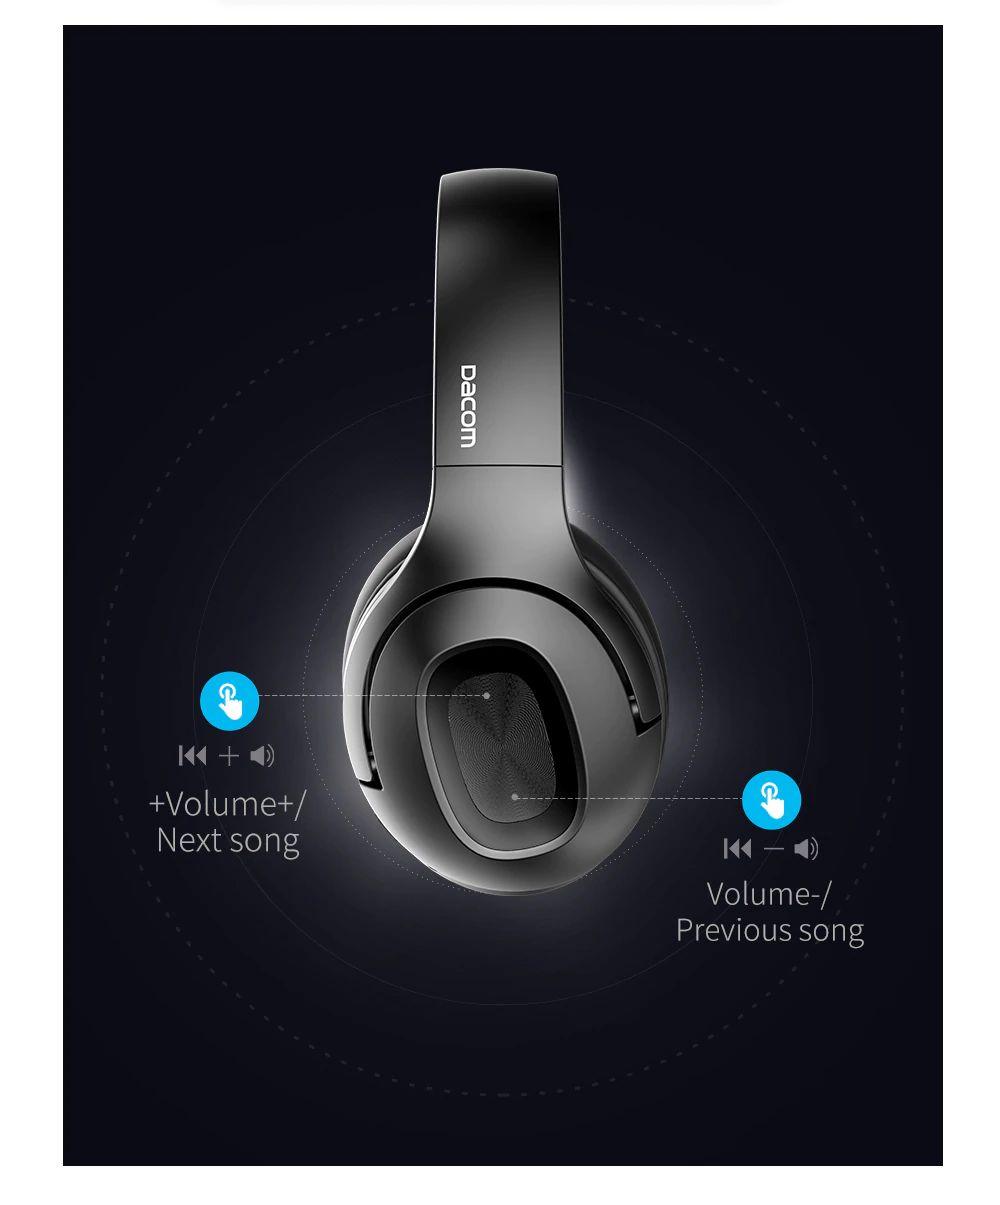 Dacom Hf002 Bluetooth Wireless Headphones (3)